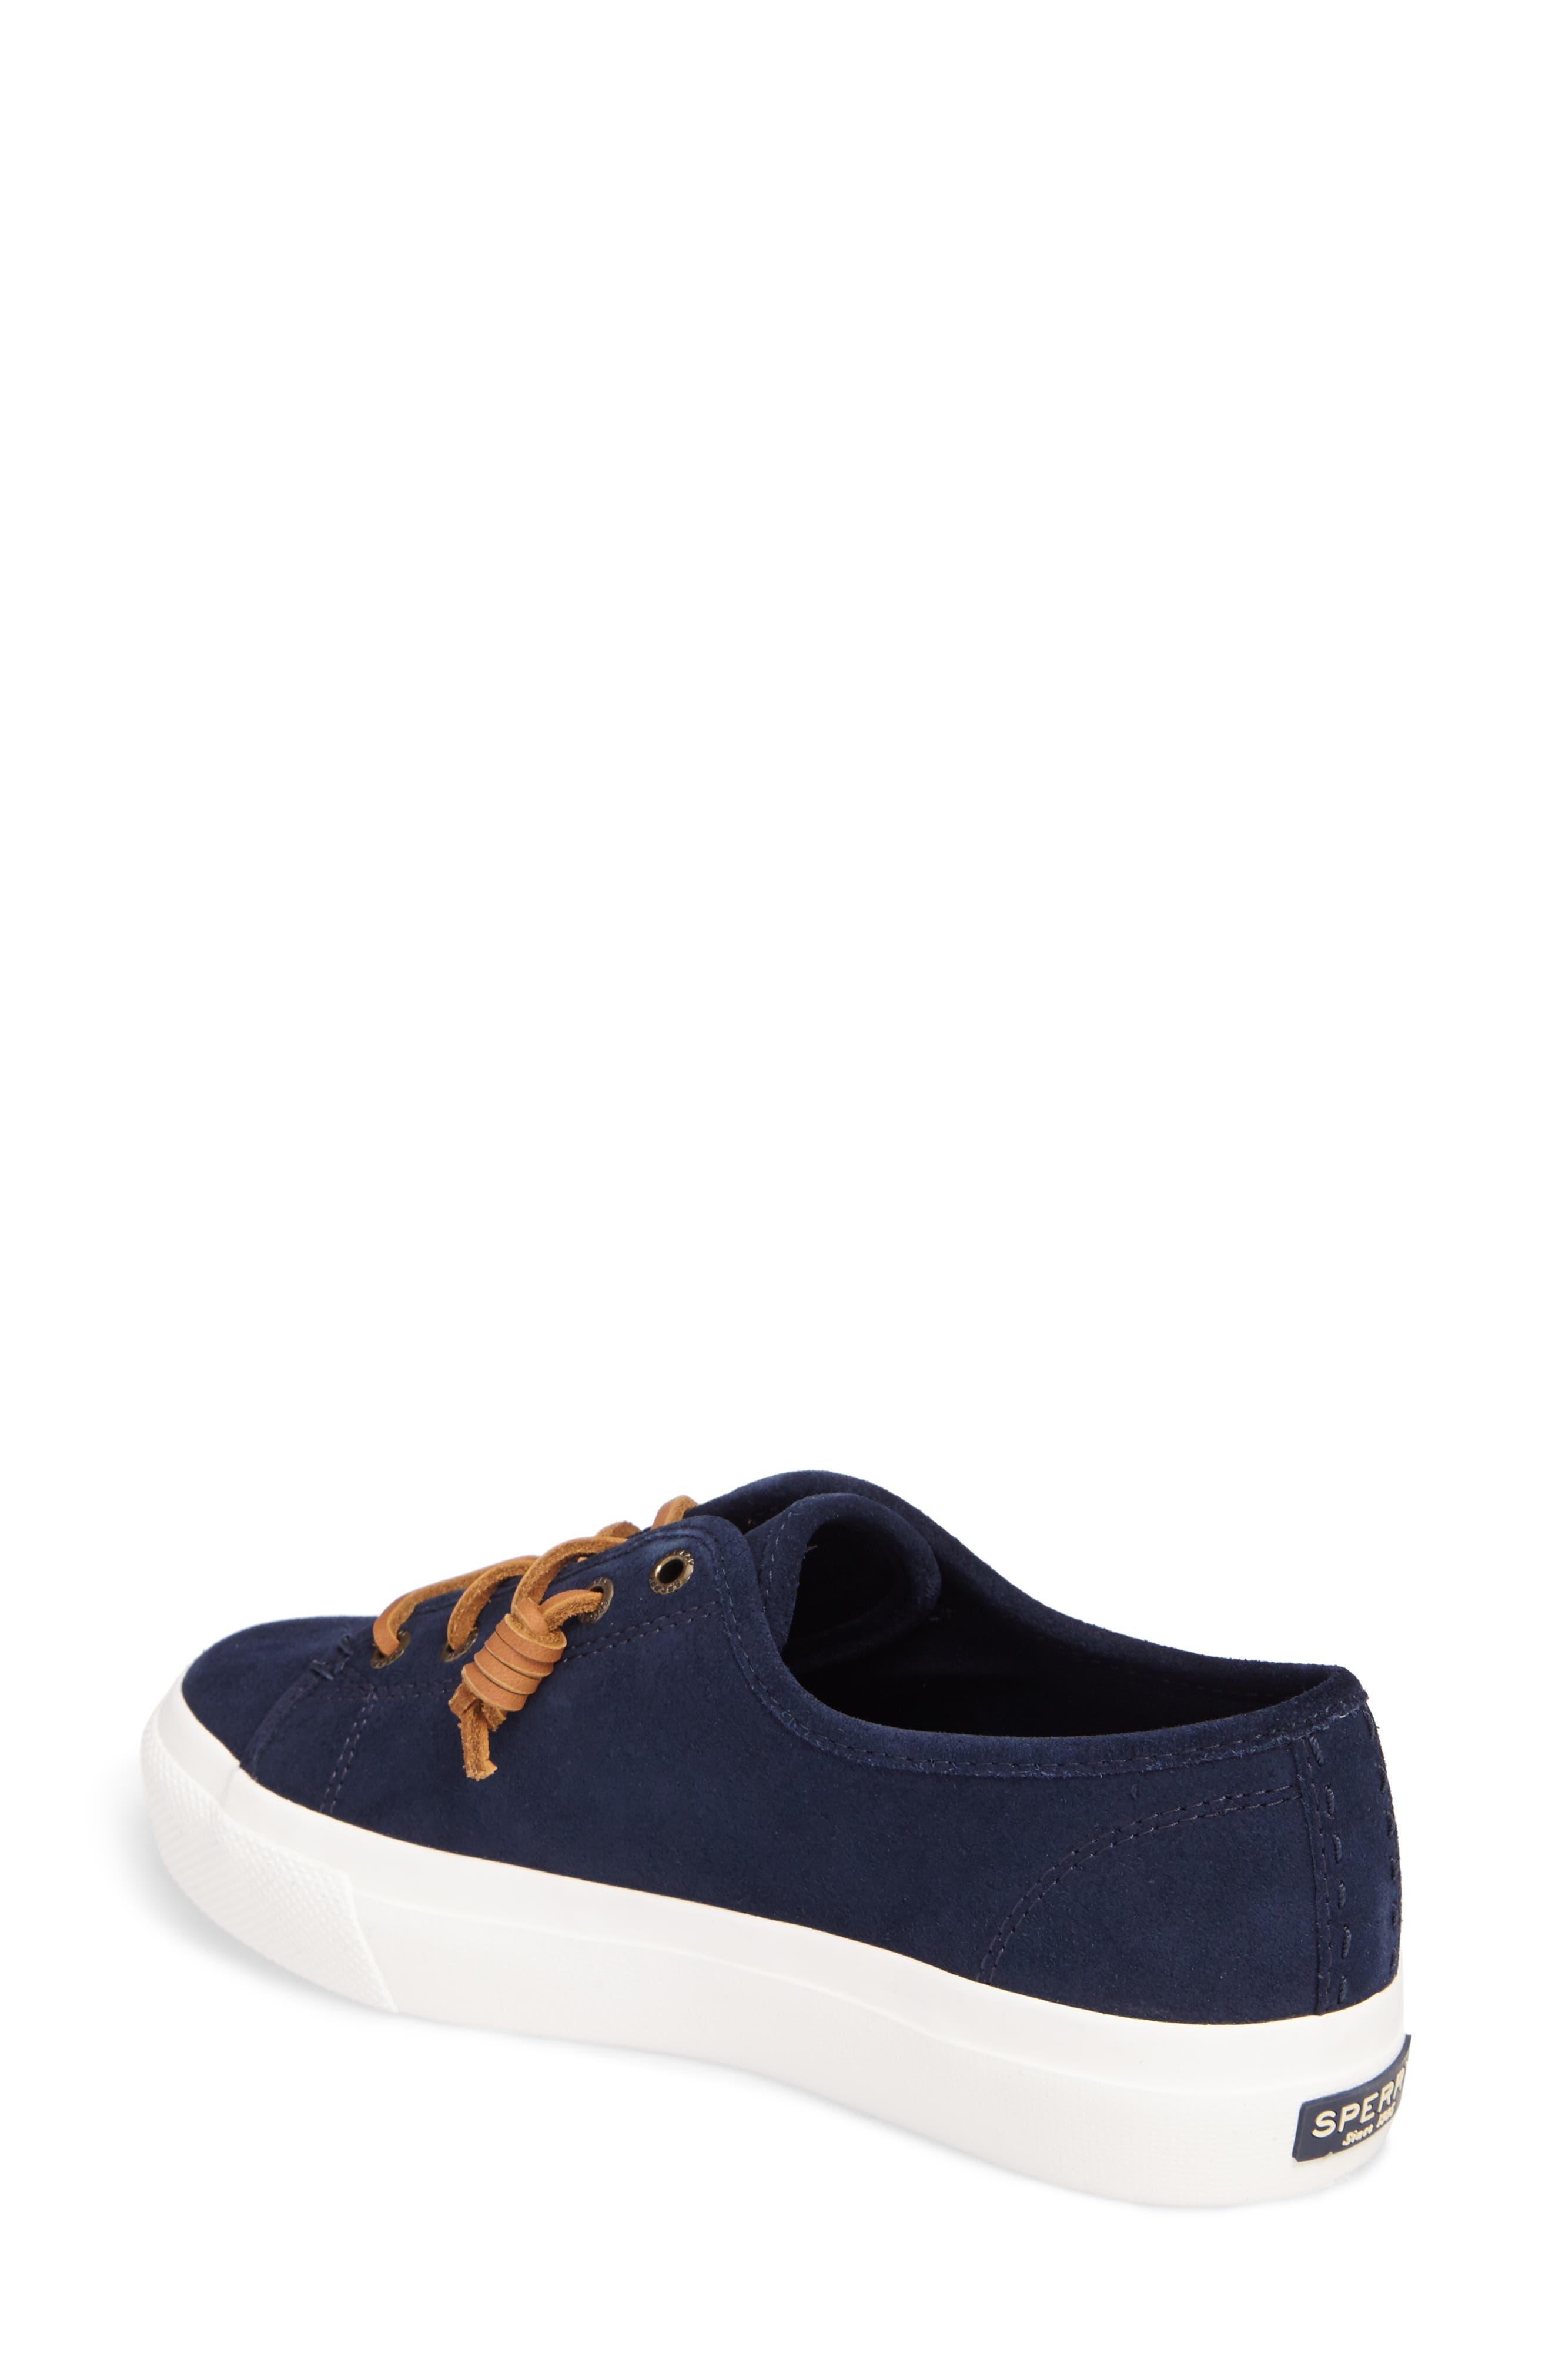 Sky Sail Platform Sneaker,                             Alternate thumbnail 2, color,                             410